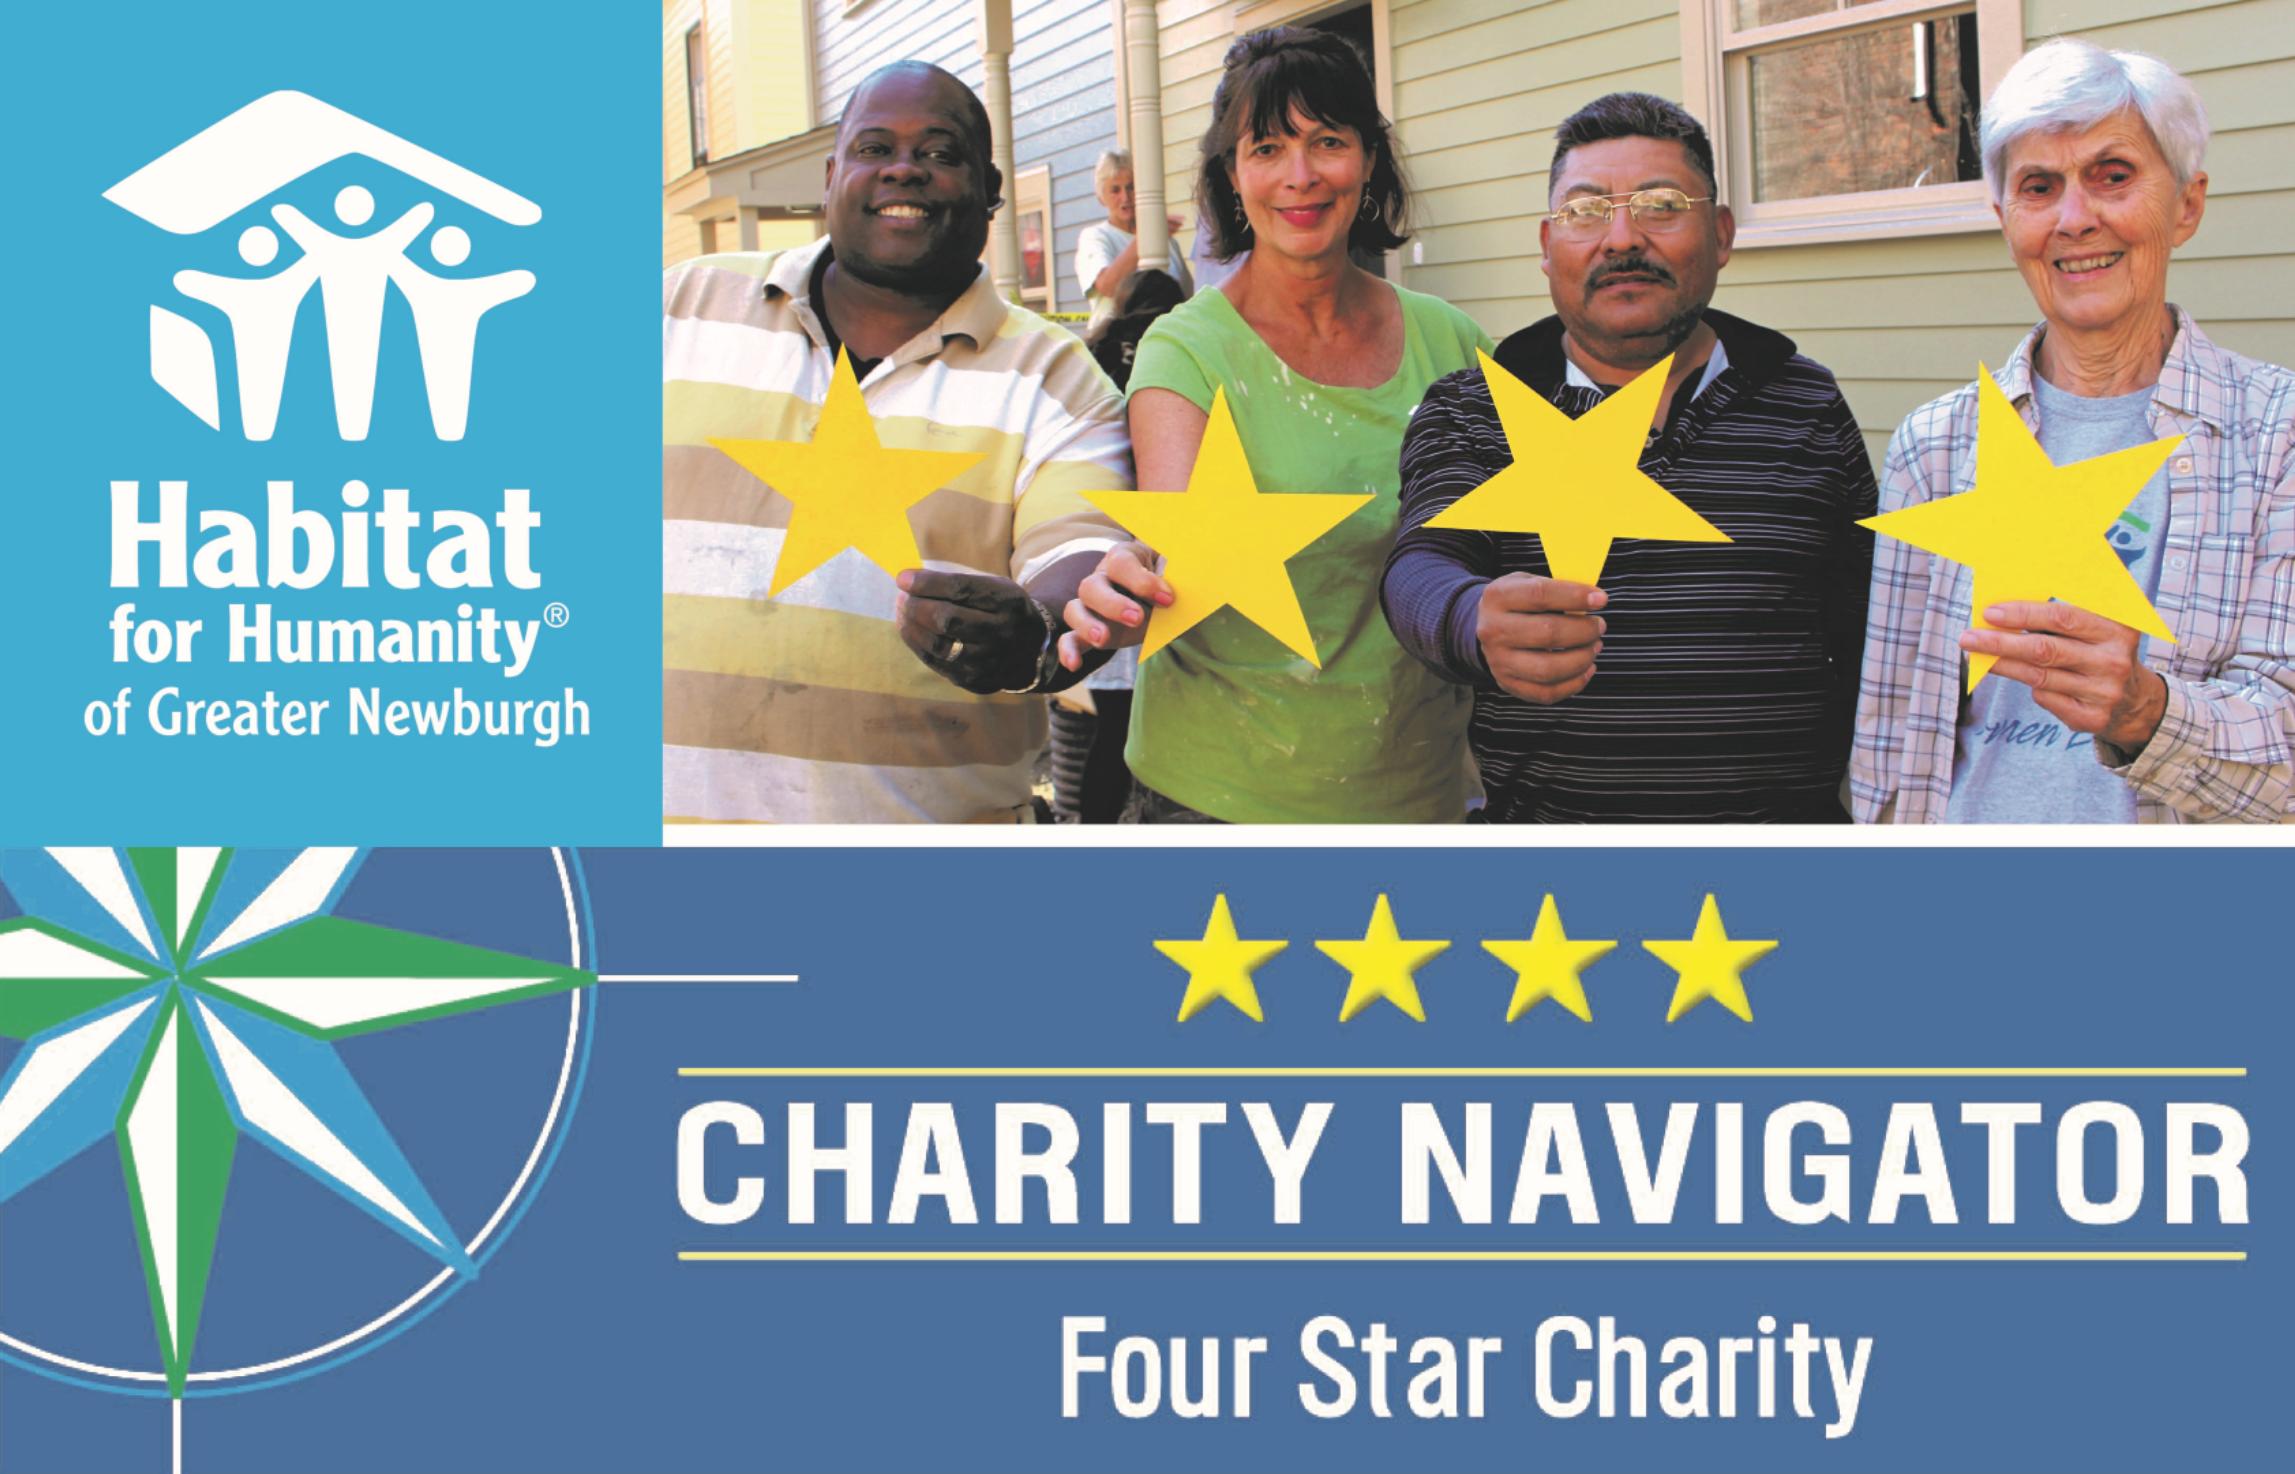 Habitat Newburgh Receives Top Rating from Charity Navigator